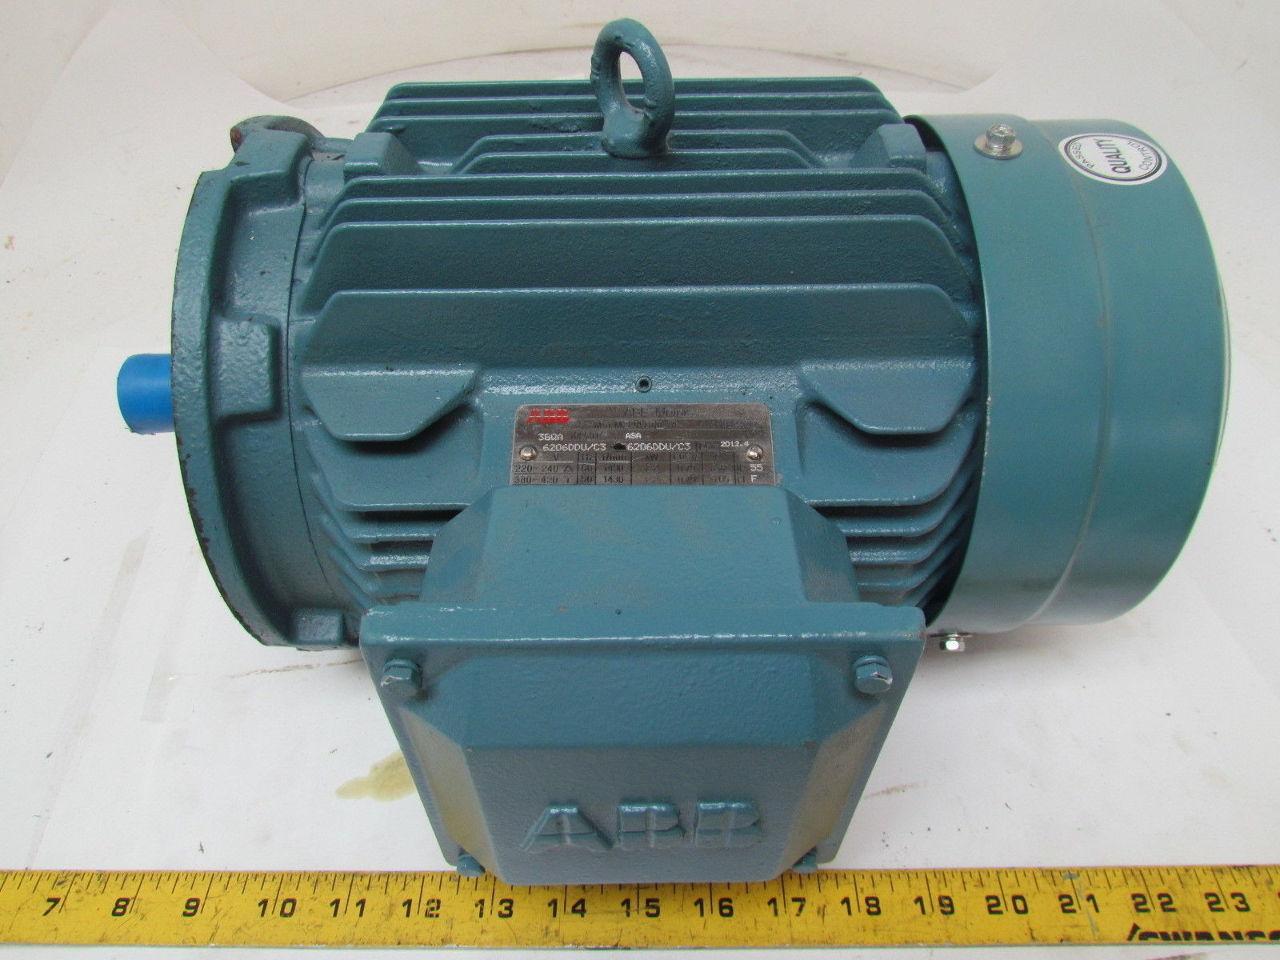 Abb m2qa100l4a 3gqa electric motor 3hp 3ph 1730rpm 240 420 for Abb motor frame size